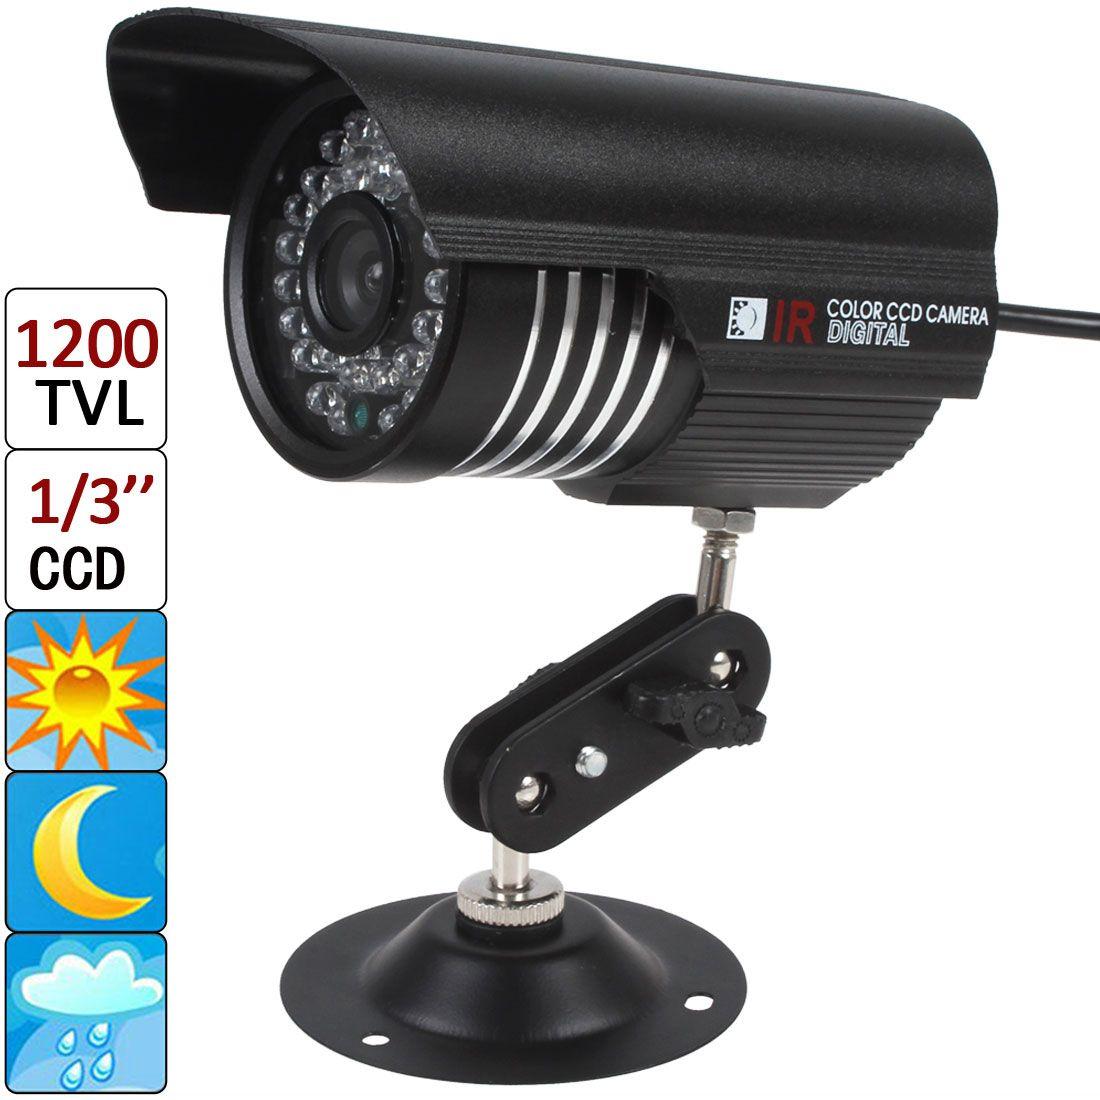 Obiettivo 1200 TVL 6mm 36 LED IR IP66 Impermeabile Night Vision Camera con sensore 1/3